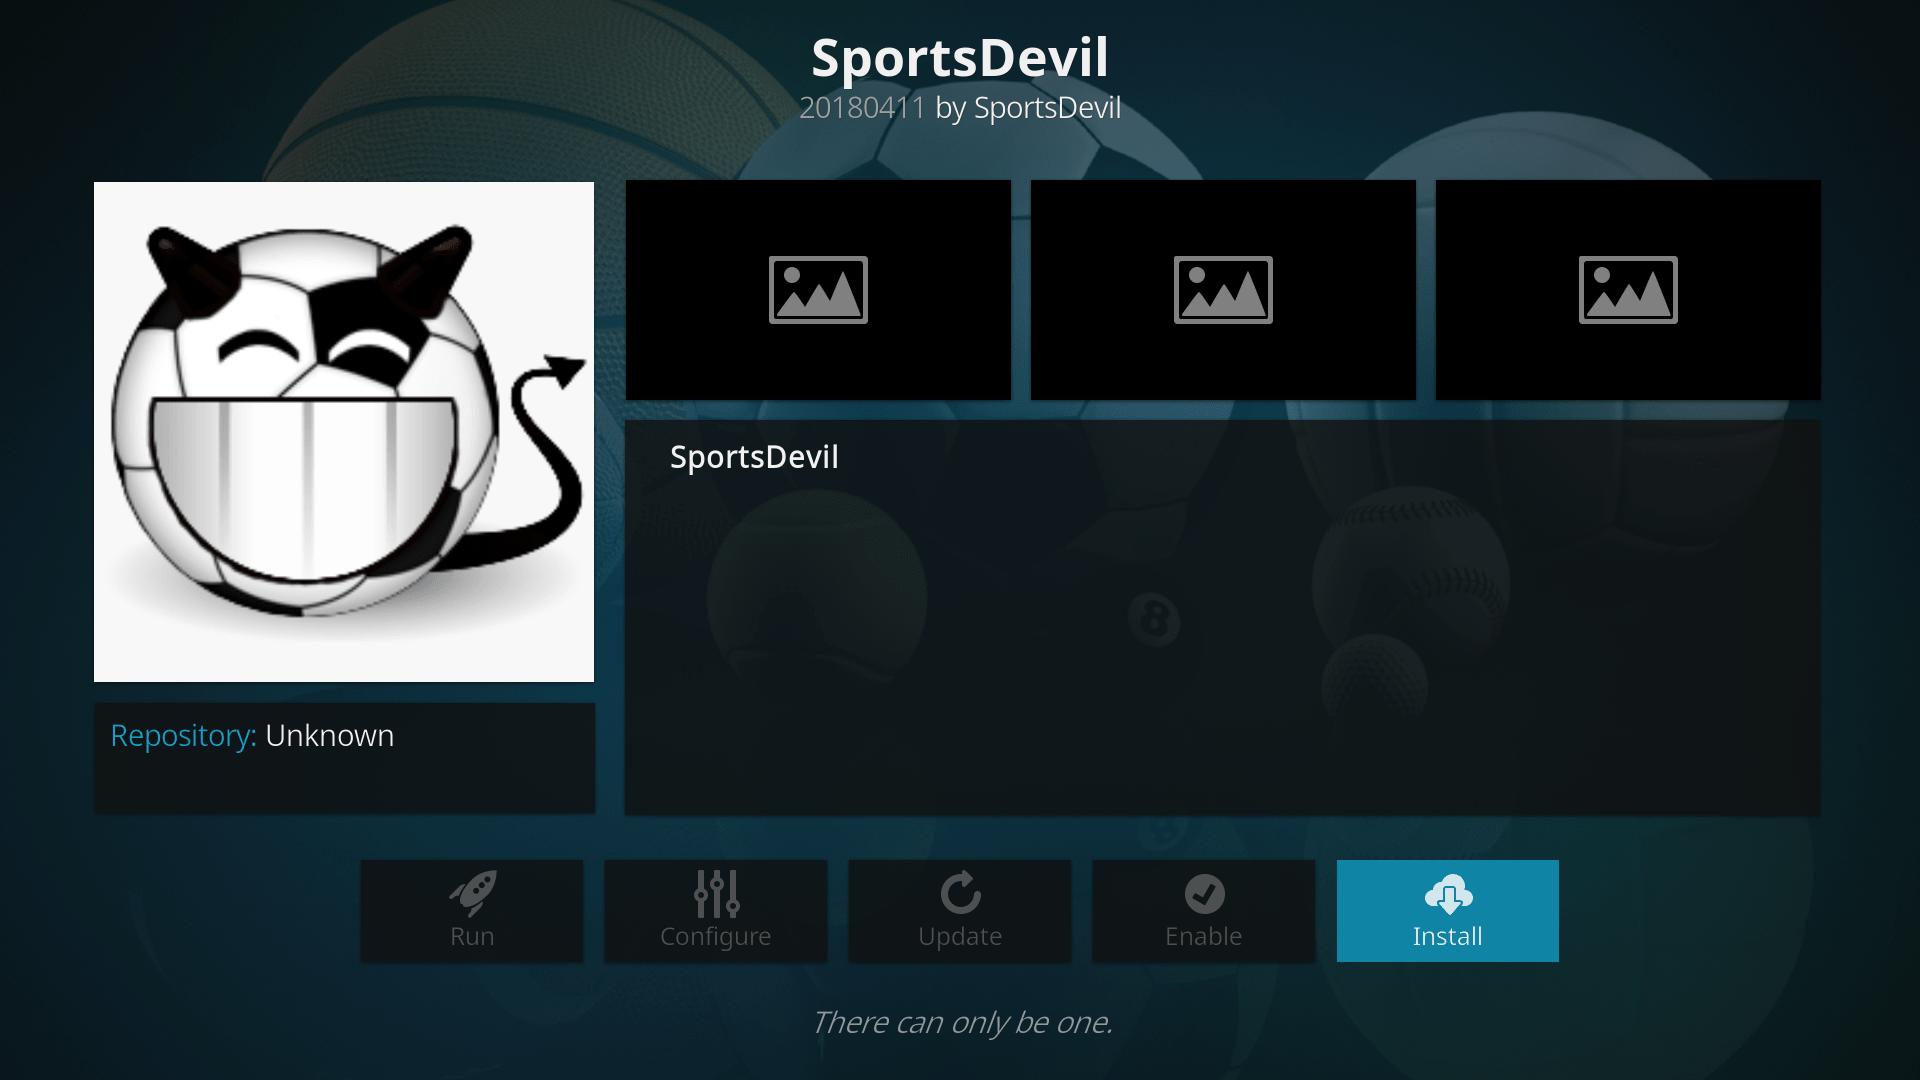 How to Install SportsDevil Addon on Kodi | BestKodi com